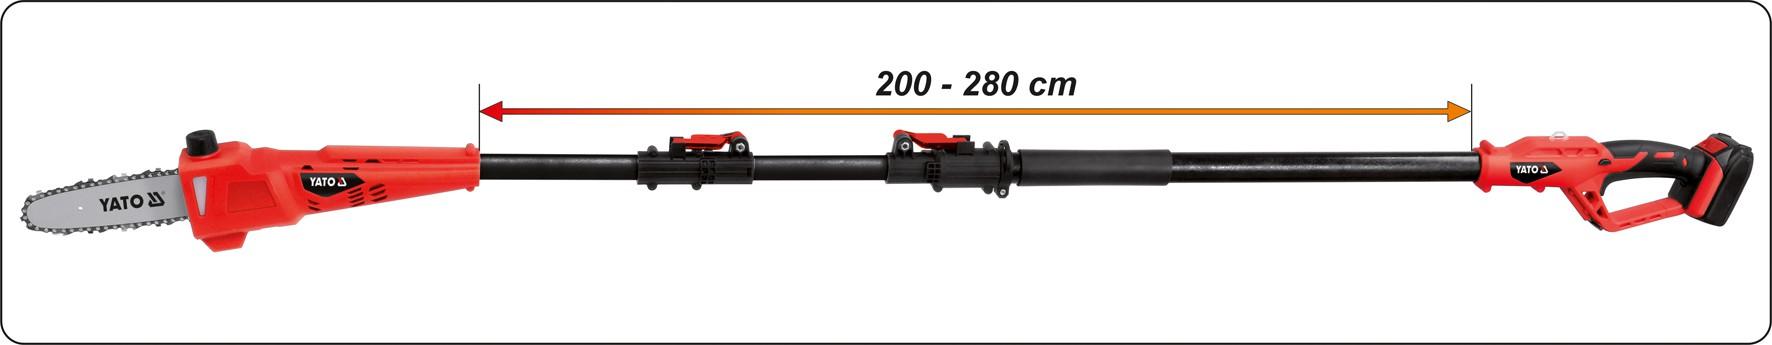 18V Motorová pila s dosahem 2-2,8 m